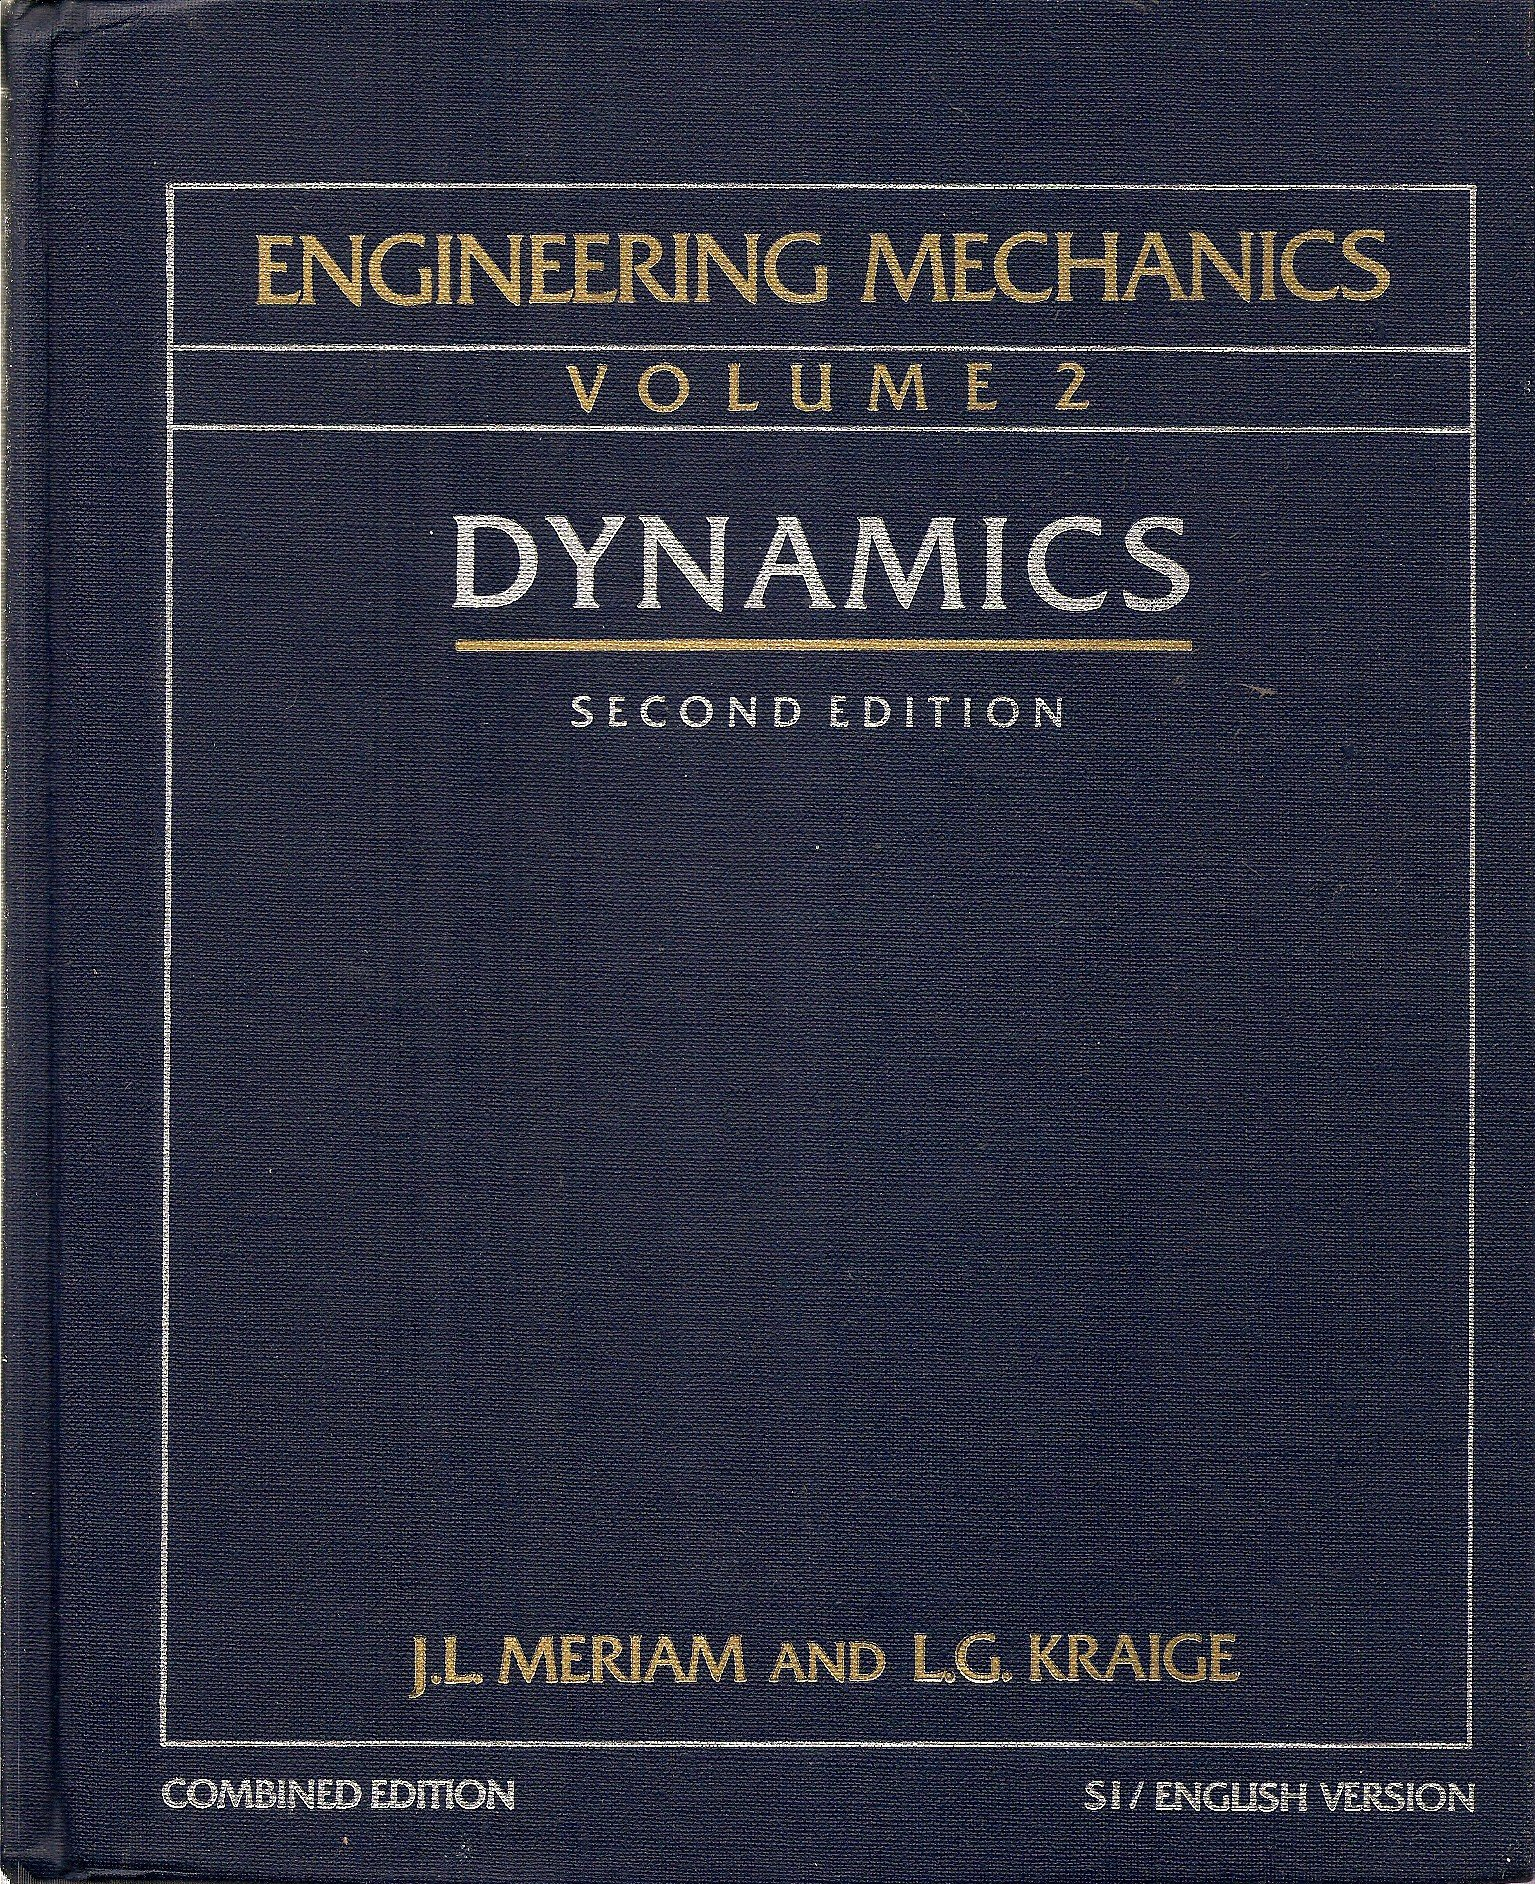 Engineering Mechanics  Statics   th Edition  J  L  Meriam  eBook     Dynamics   nd edition  SI version   J  L  Meriam                  Amazon com  Books